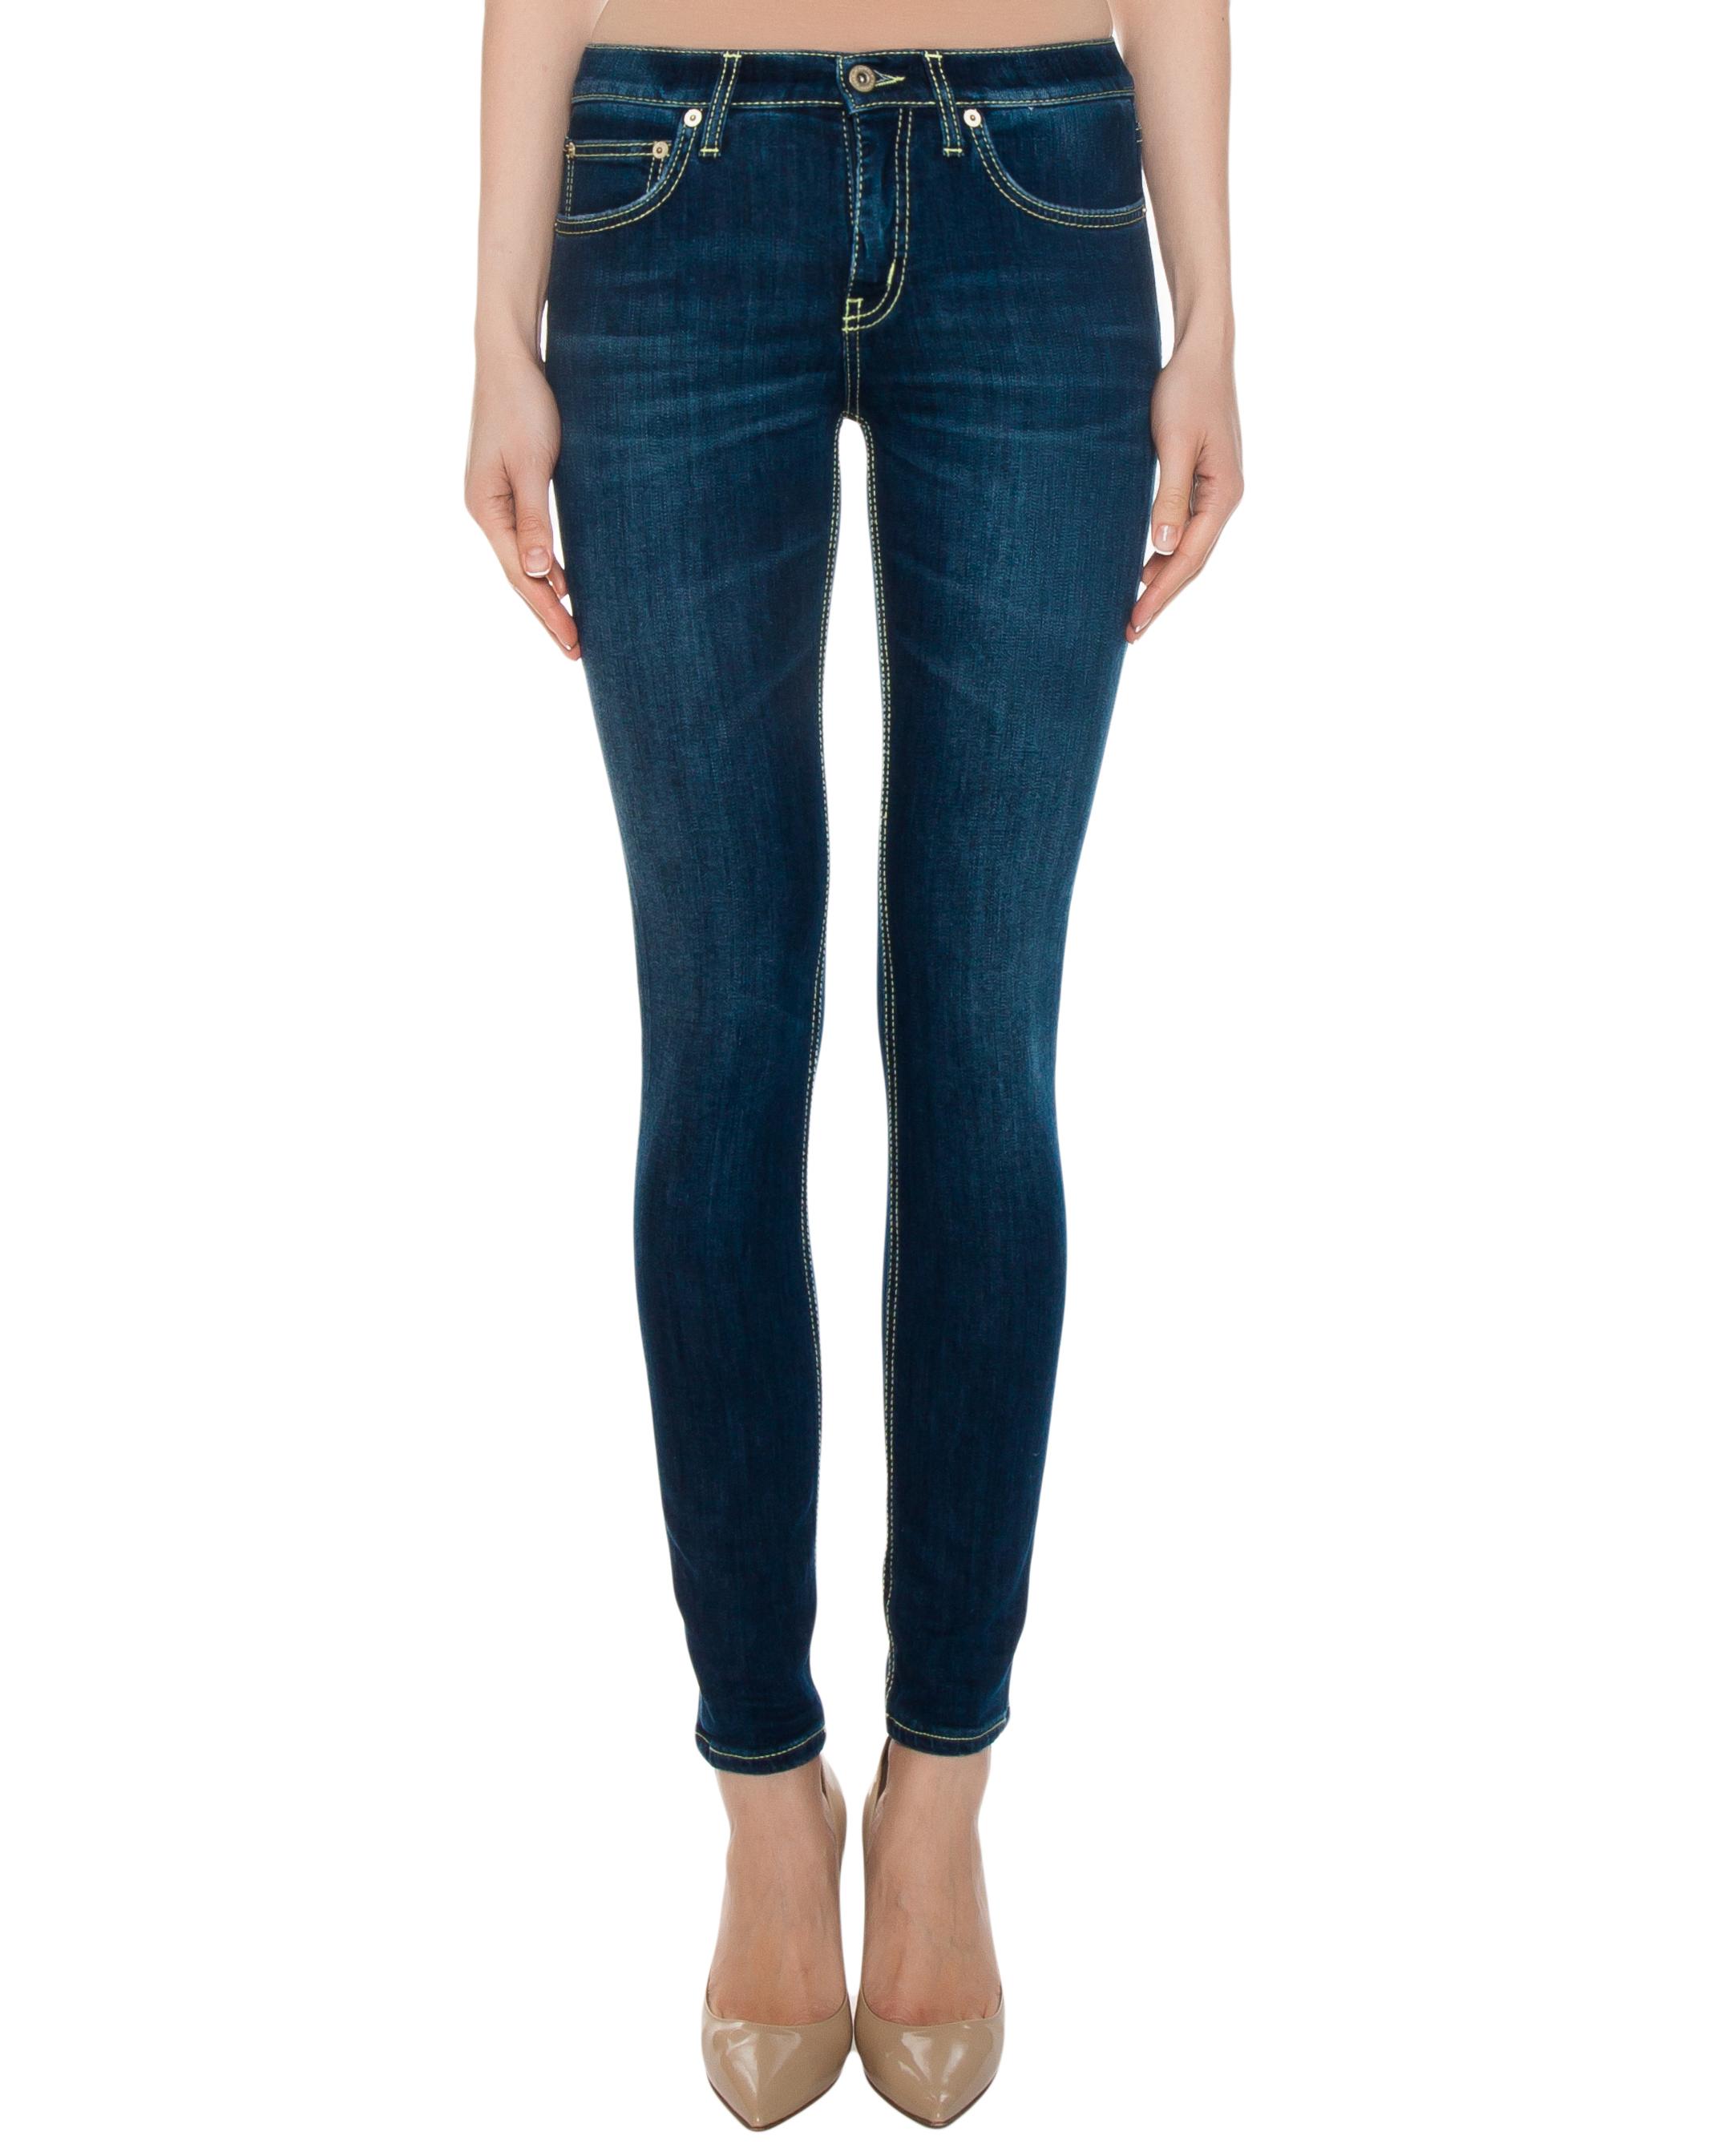 джинсы  артикул P998 марки DONDUP купить за 7000 руб.